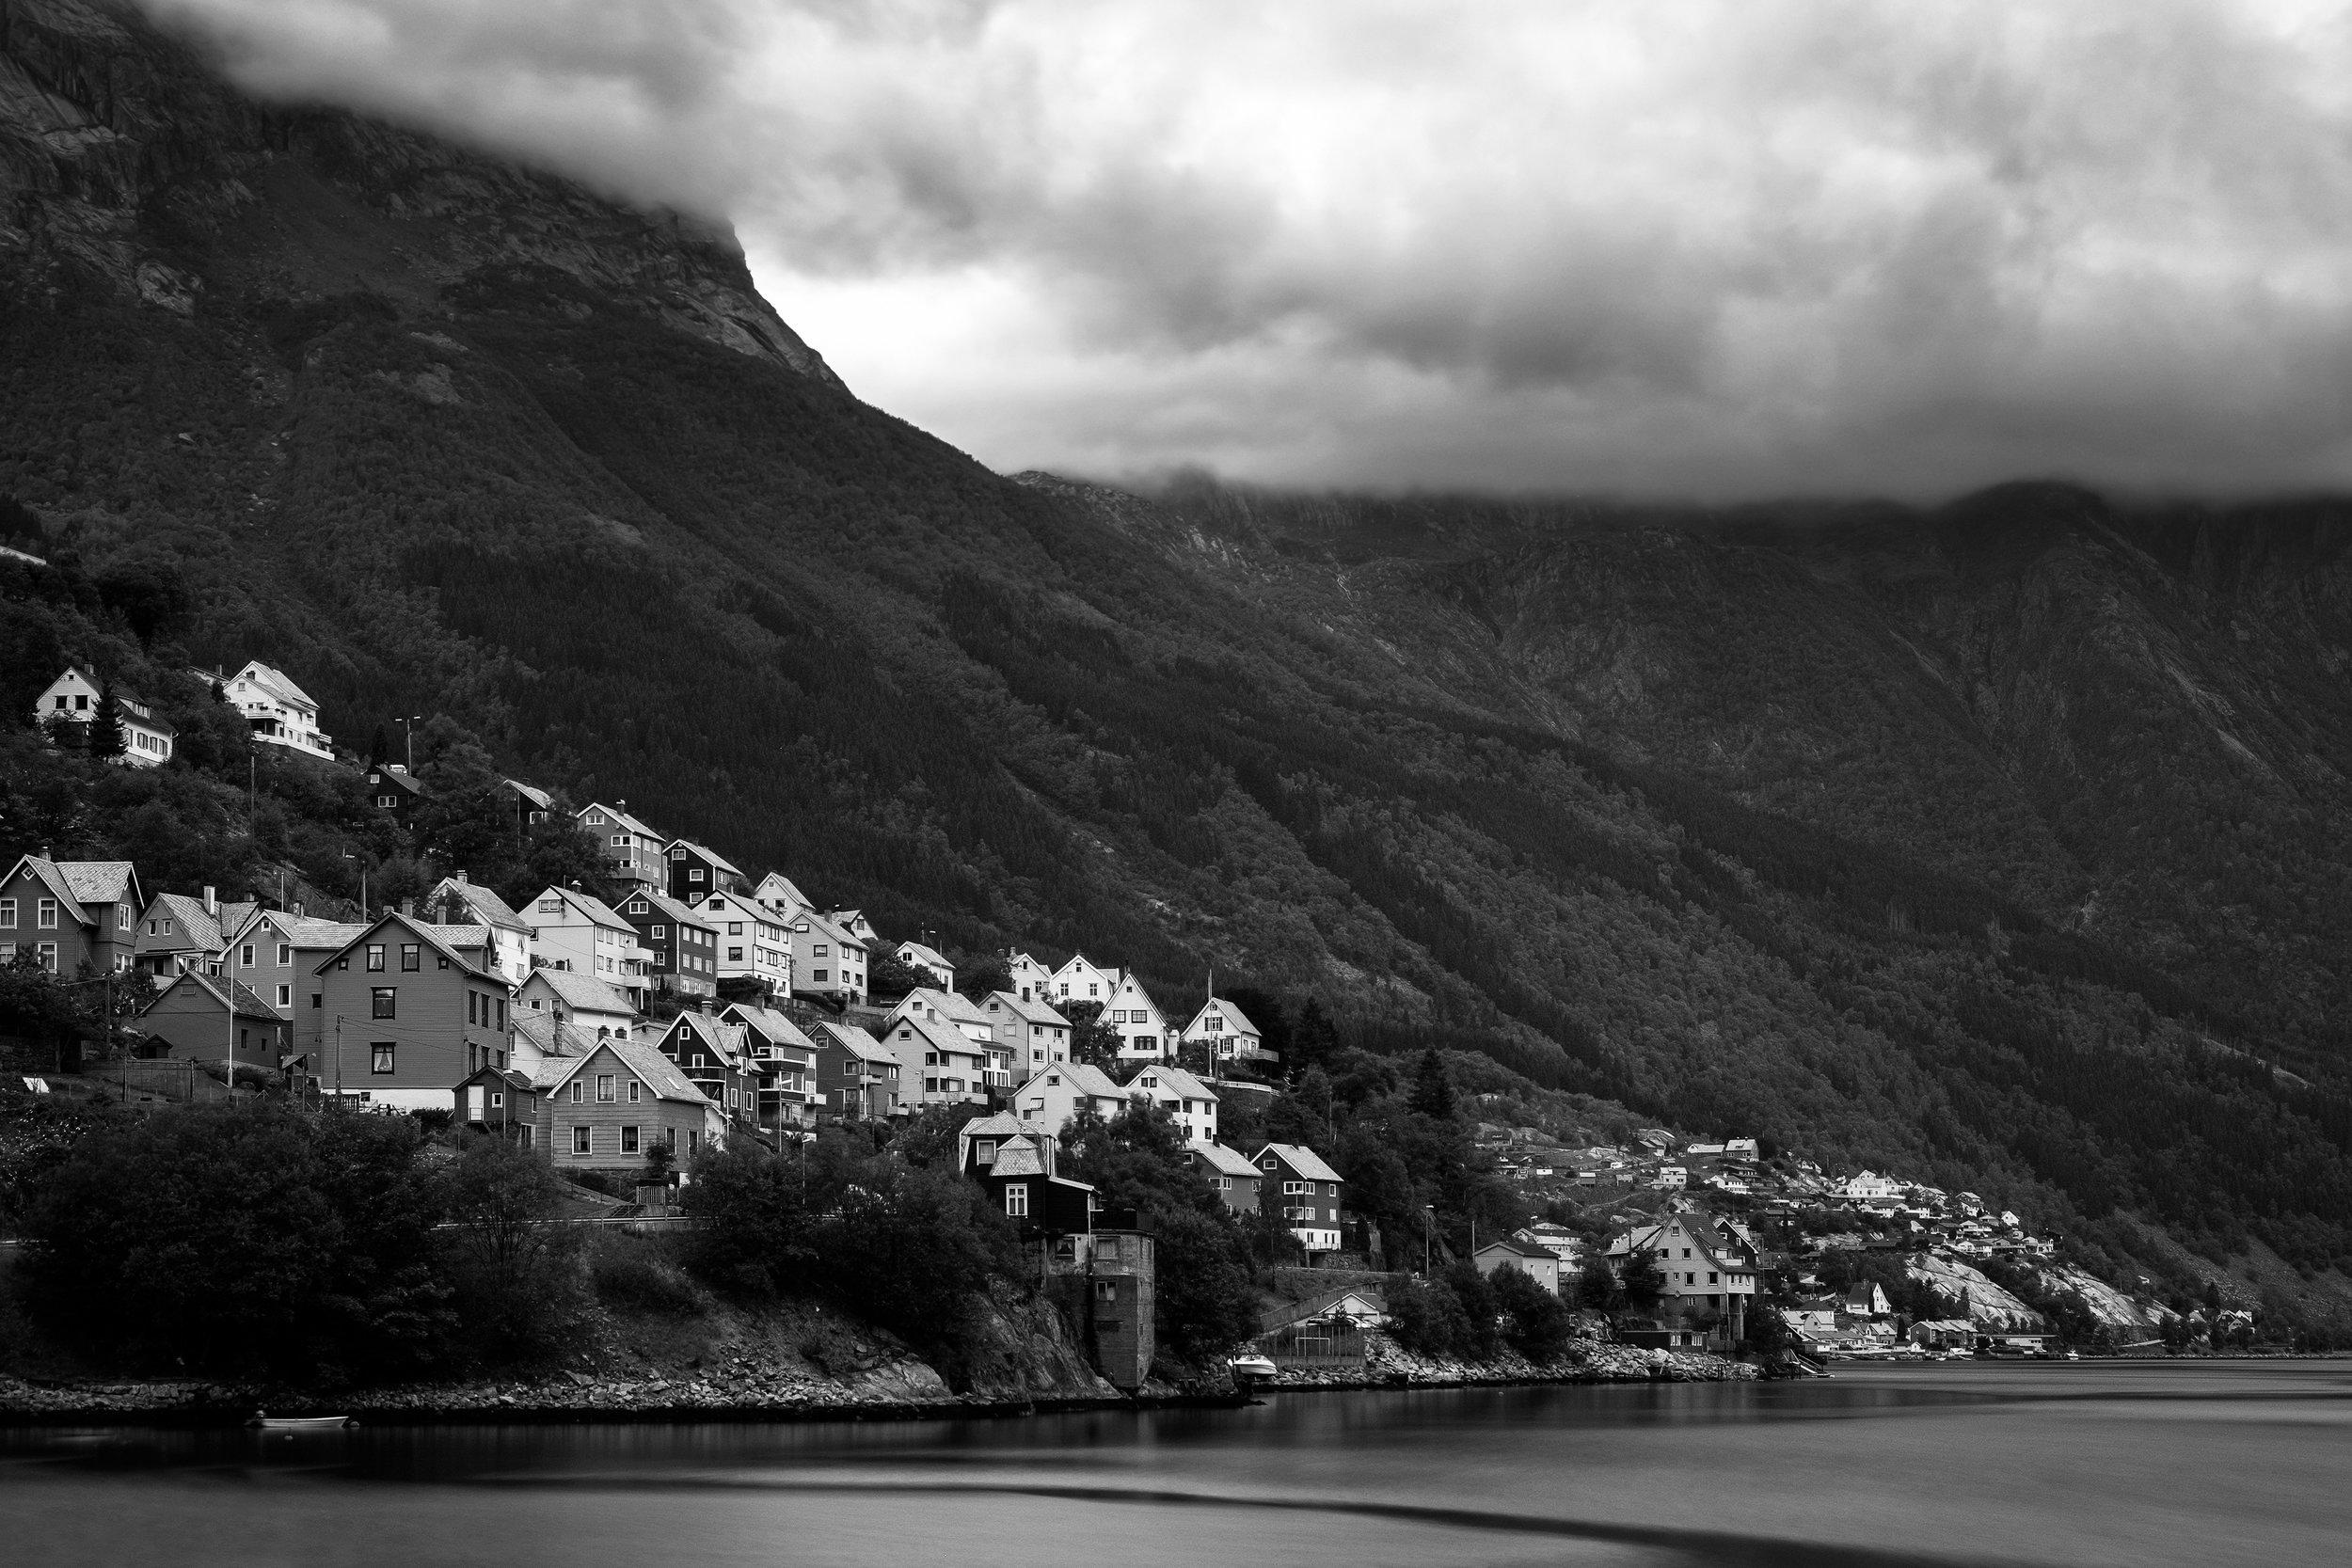 The village of Odda, Norway